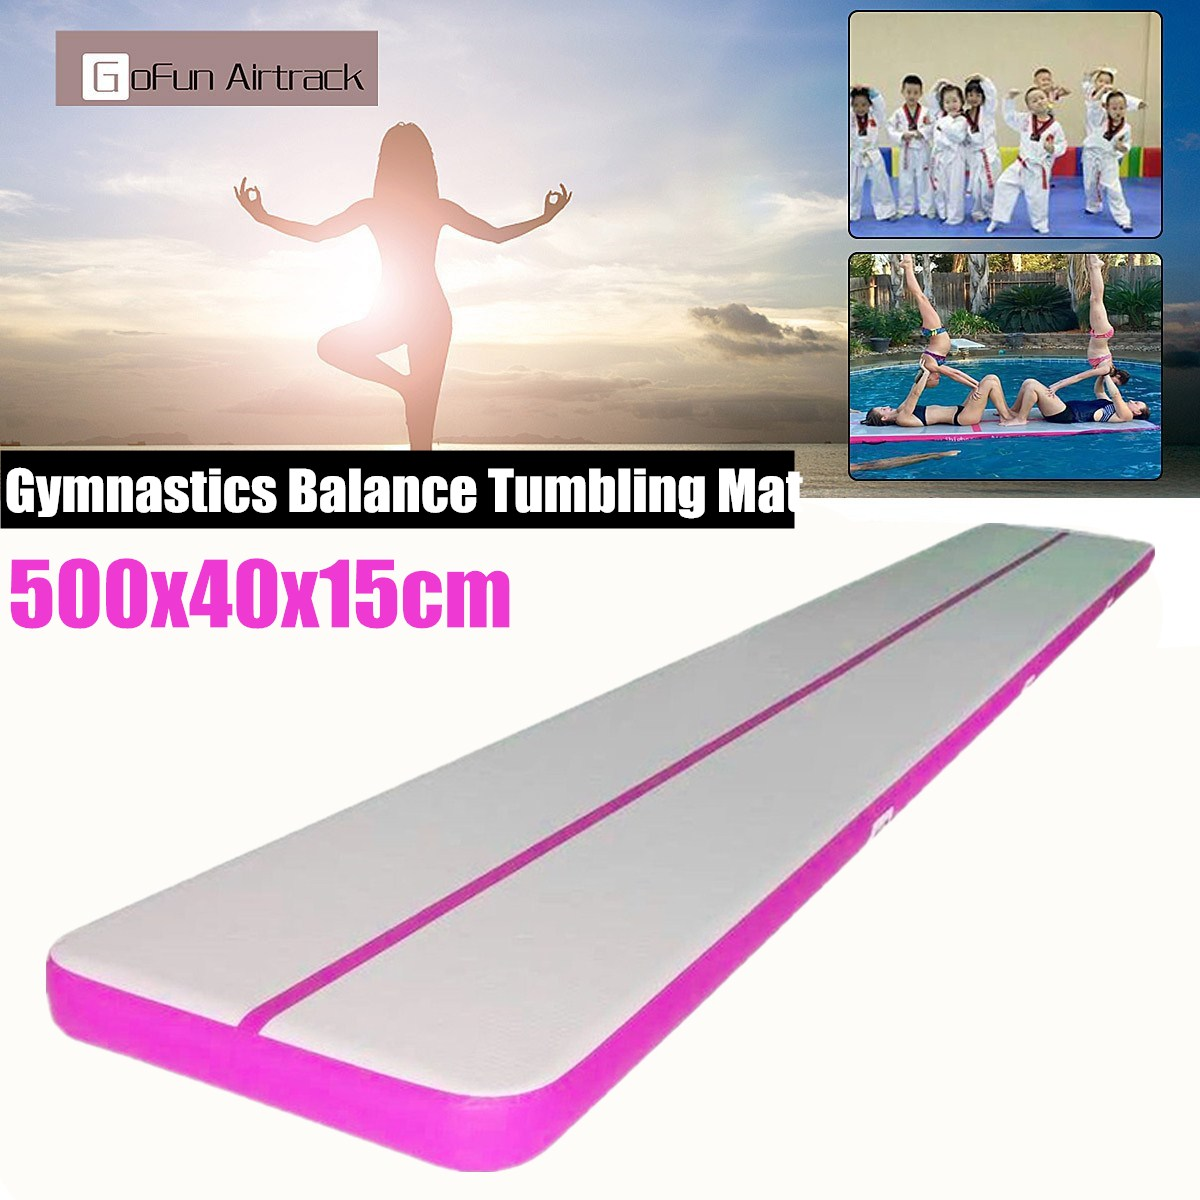 1Pcs 10ft/16.4ft Inflatable Gymnastics Tumbling Mats Air Track Floor Airtrack Tumbling Yoga Mat Practice Training Pad For Home Use, Gymnastics